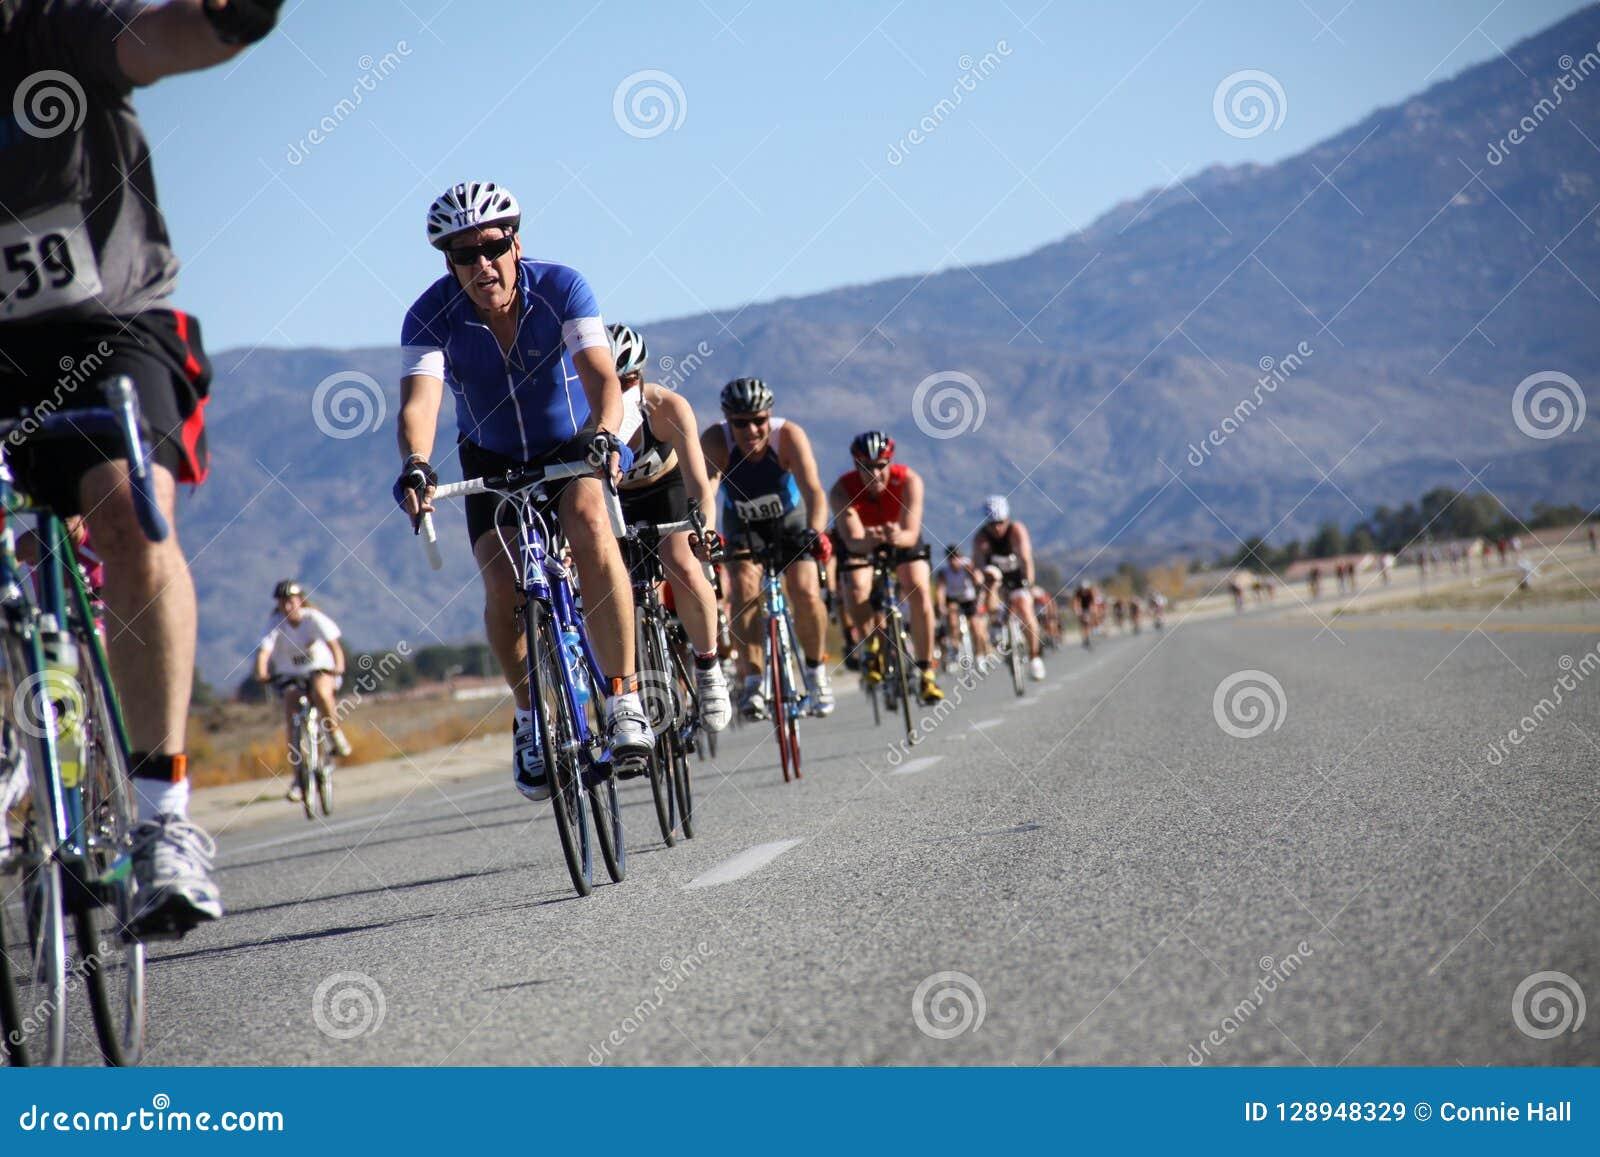 Tinsel Triathlon Bike Route Editorial Stock Image - Image of